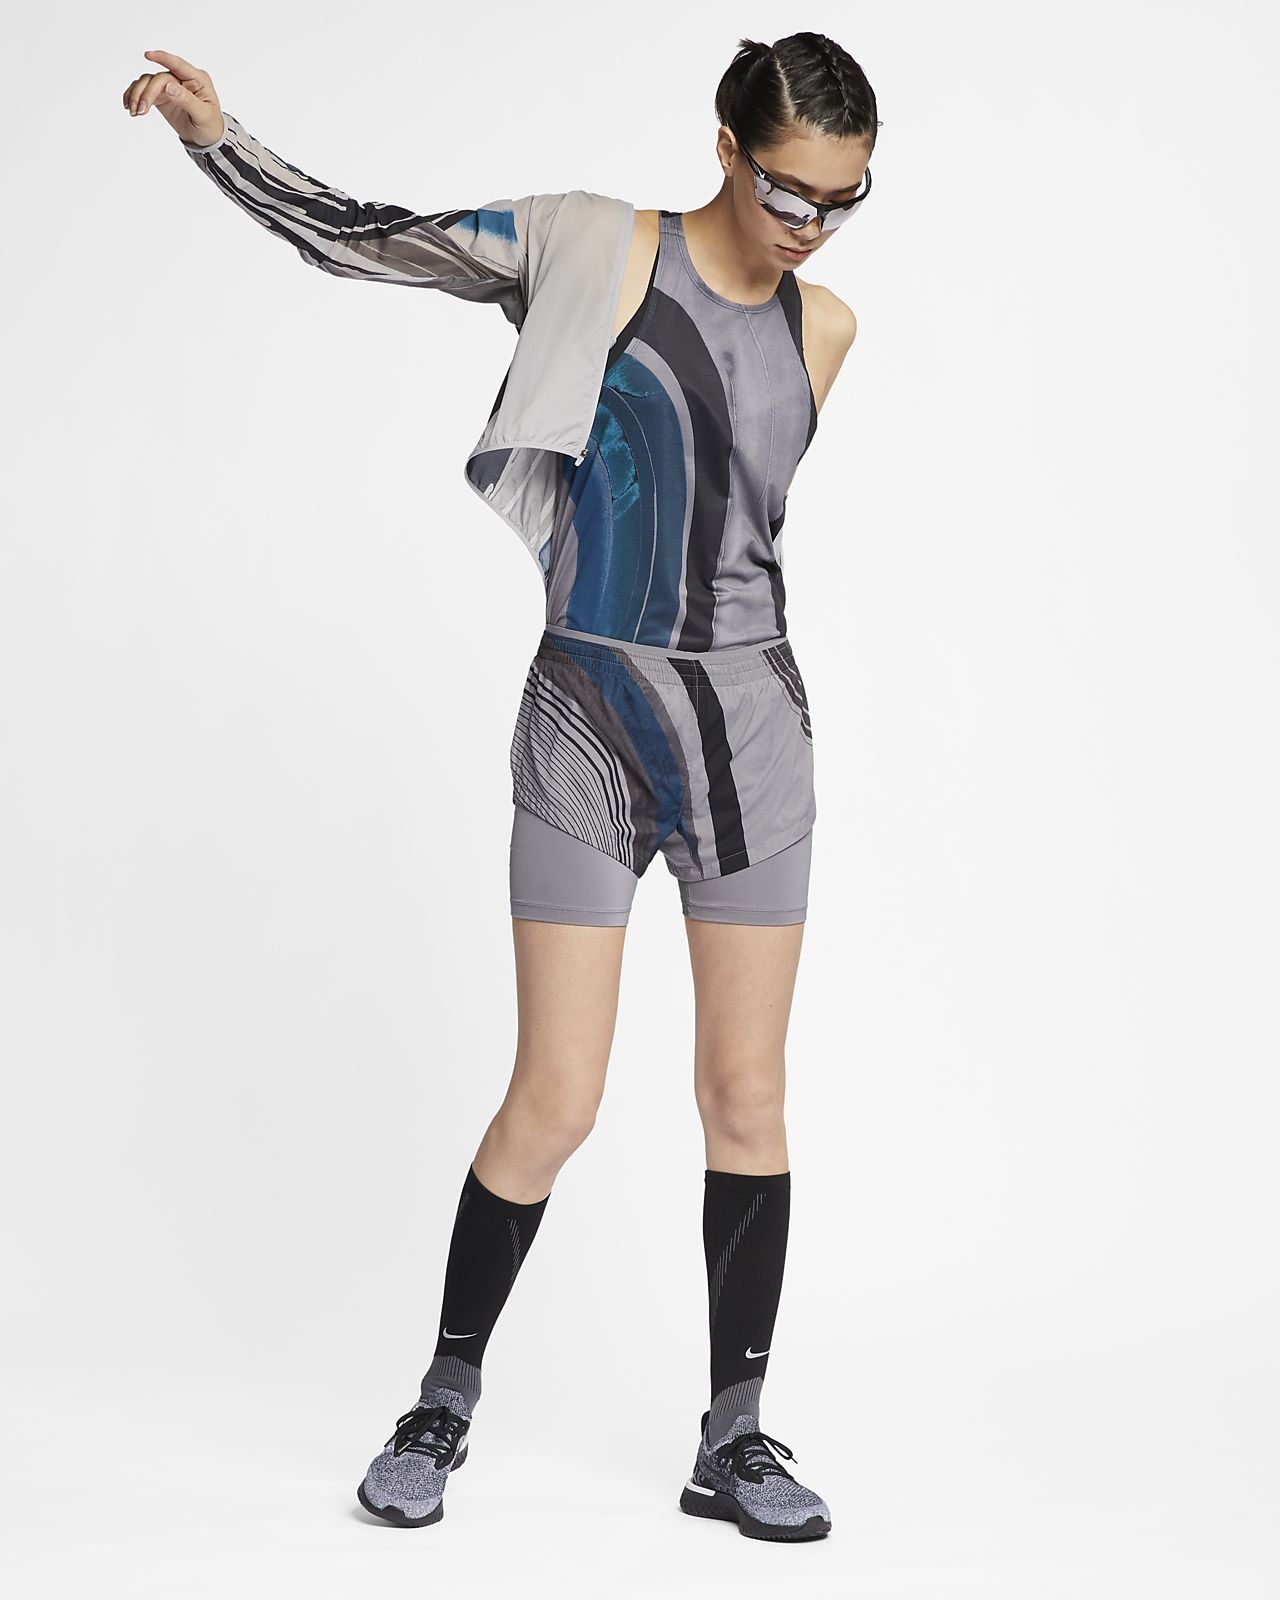 Nike Impossibly Light Damen-Laufjacke mit Kapuze